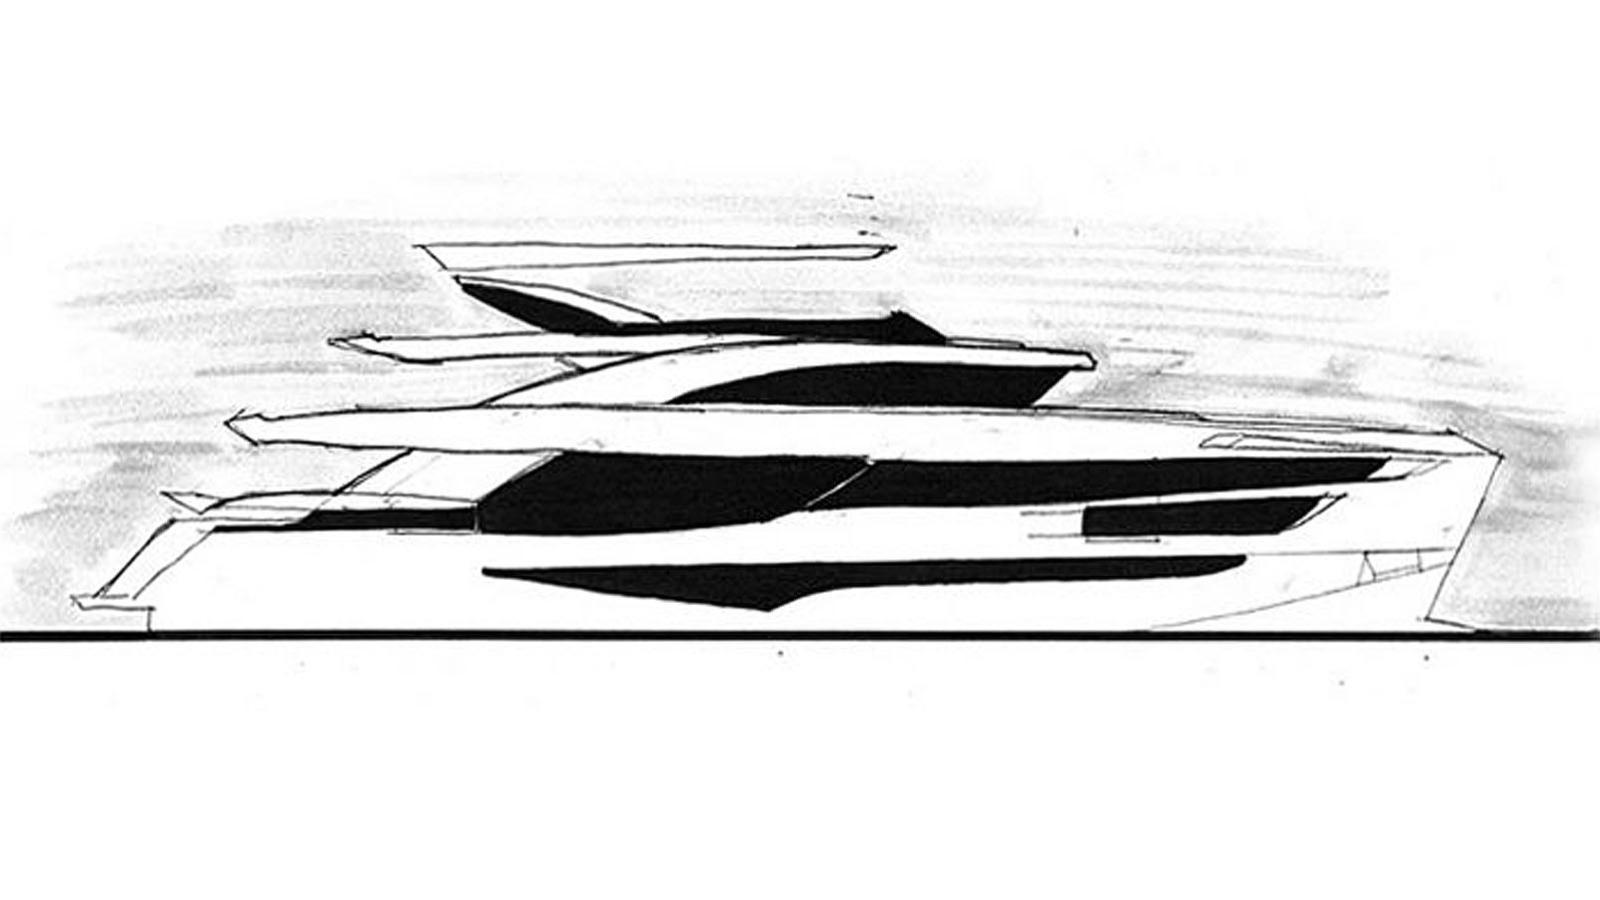 kalliente ii motoryacht dominator ilumen 38m 2019 rendering